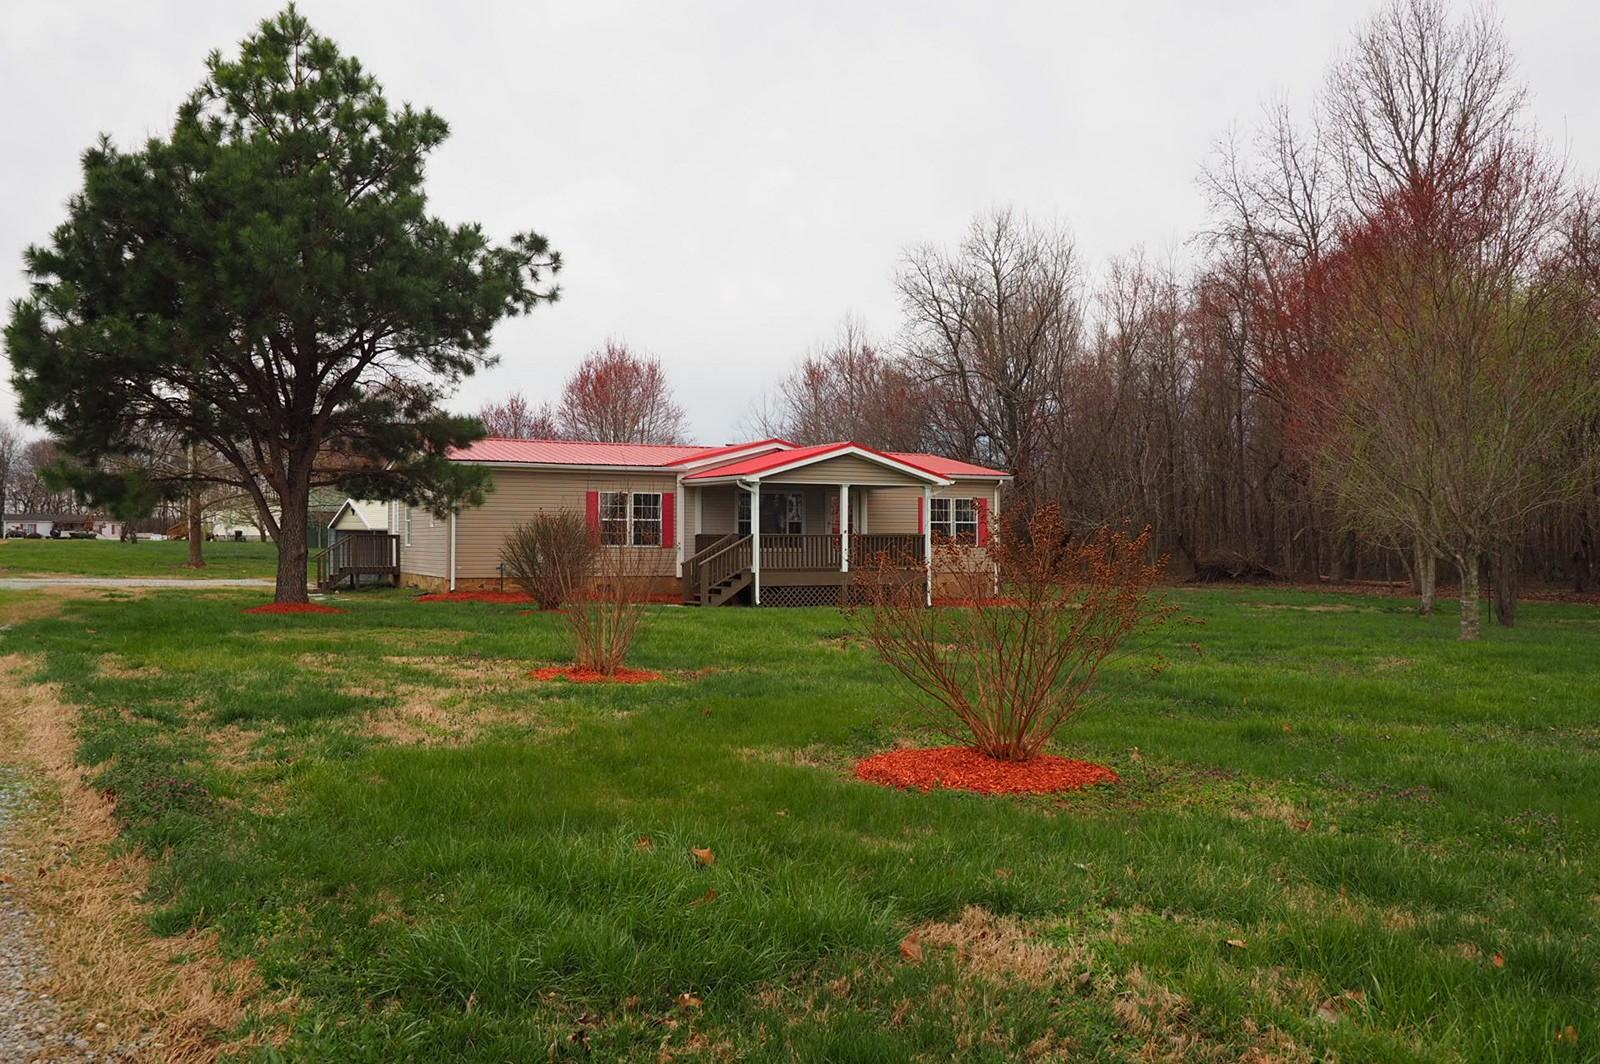 8306 Highway 41N, Adams, TN 37010 - Adams, TN real estate listing